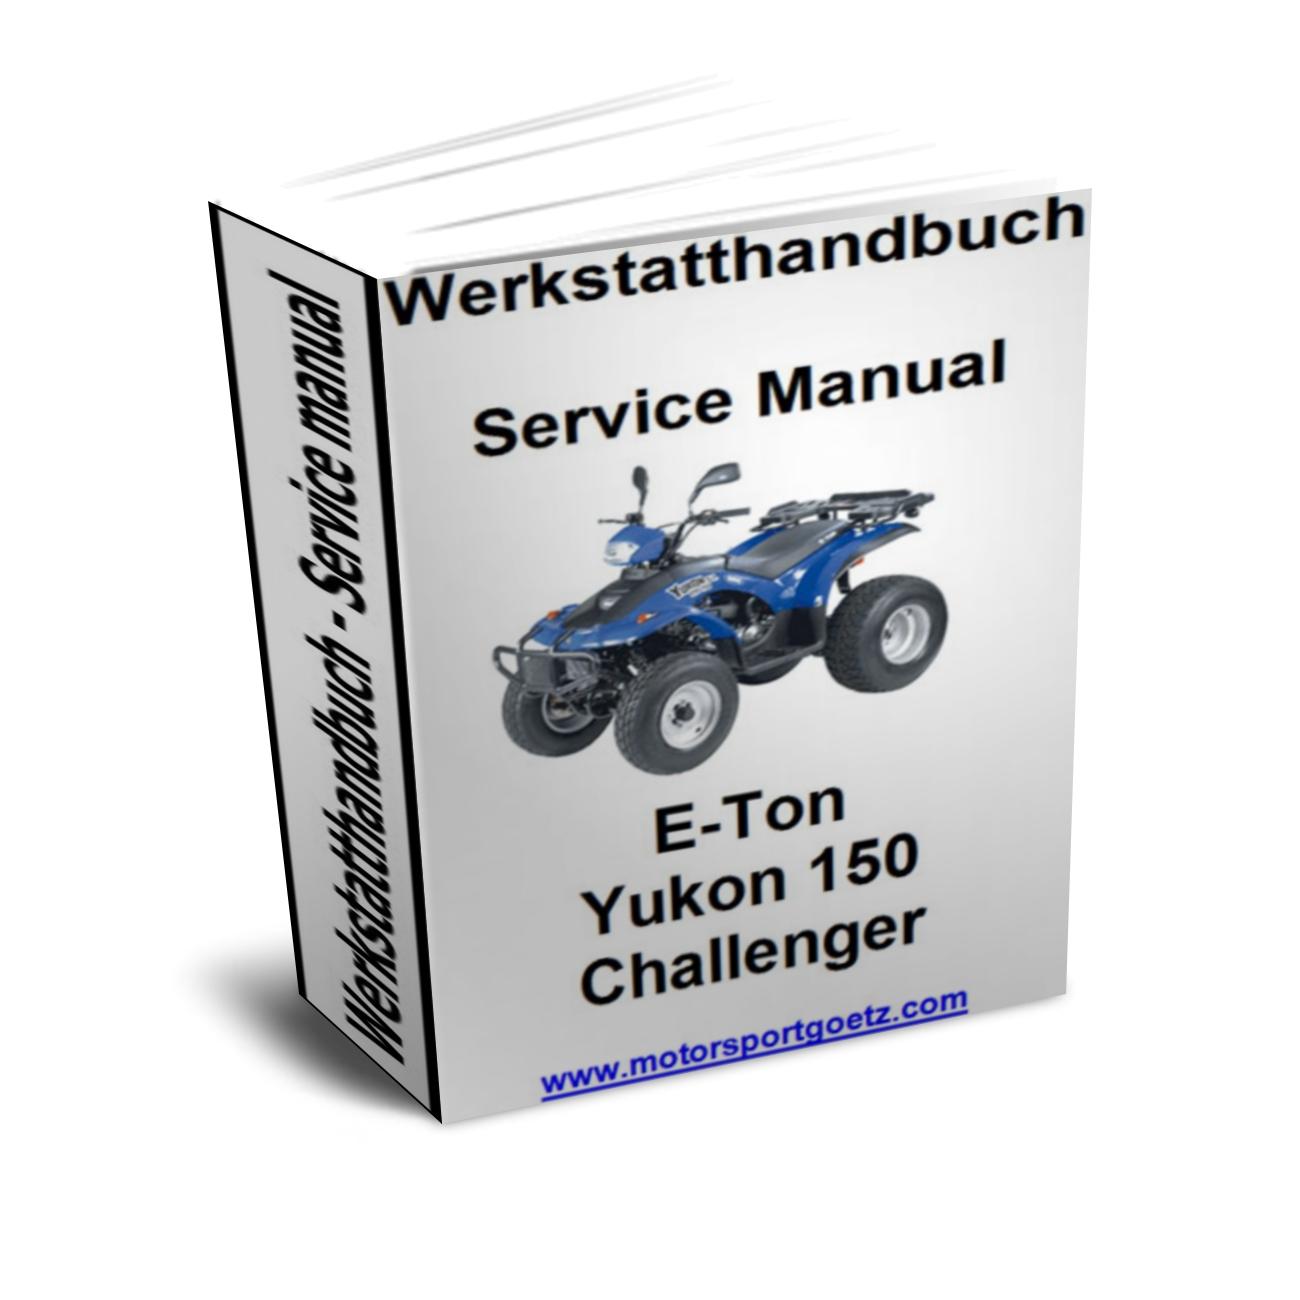 repair manual workshop manual e ton yukon 150 challenger quad atv rh motorsportgoetz com Yukon CXL 150 Parts 2000 Eton Yukon 150 ATV